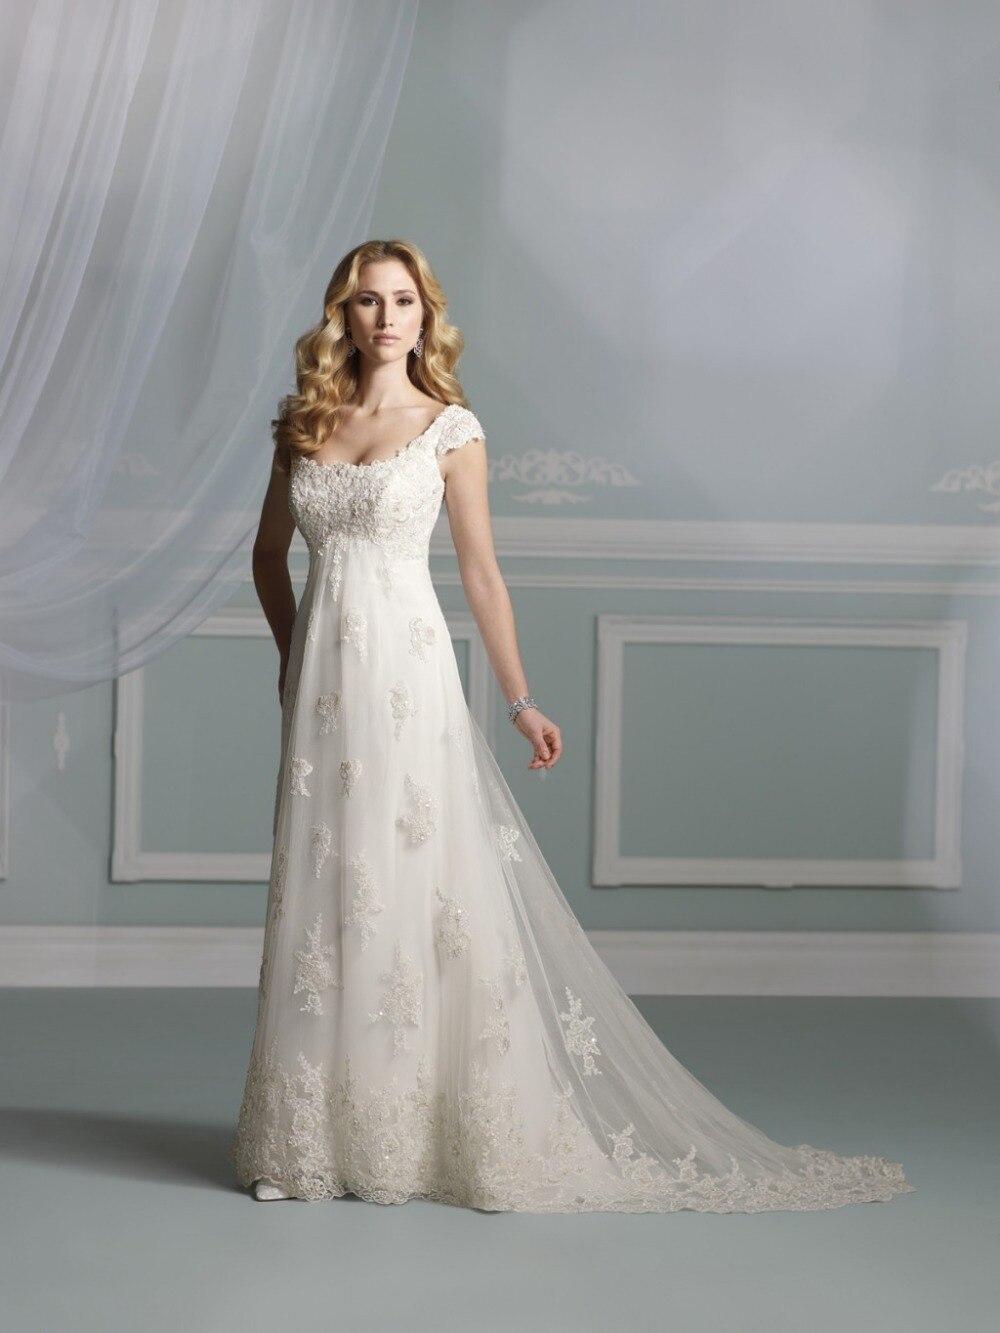 Bridal Dresses For Pregnant Women 53